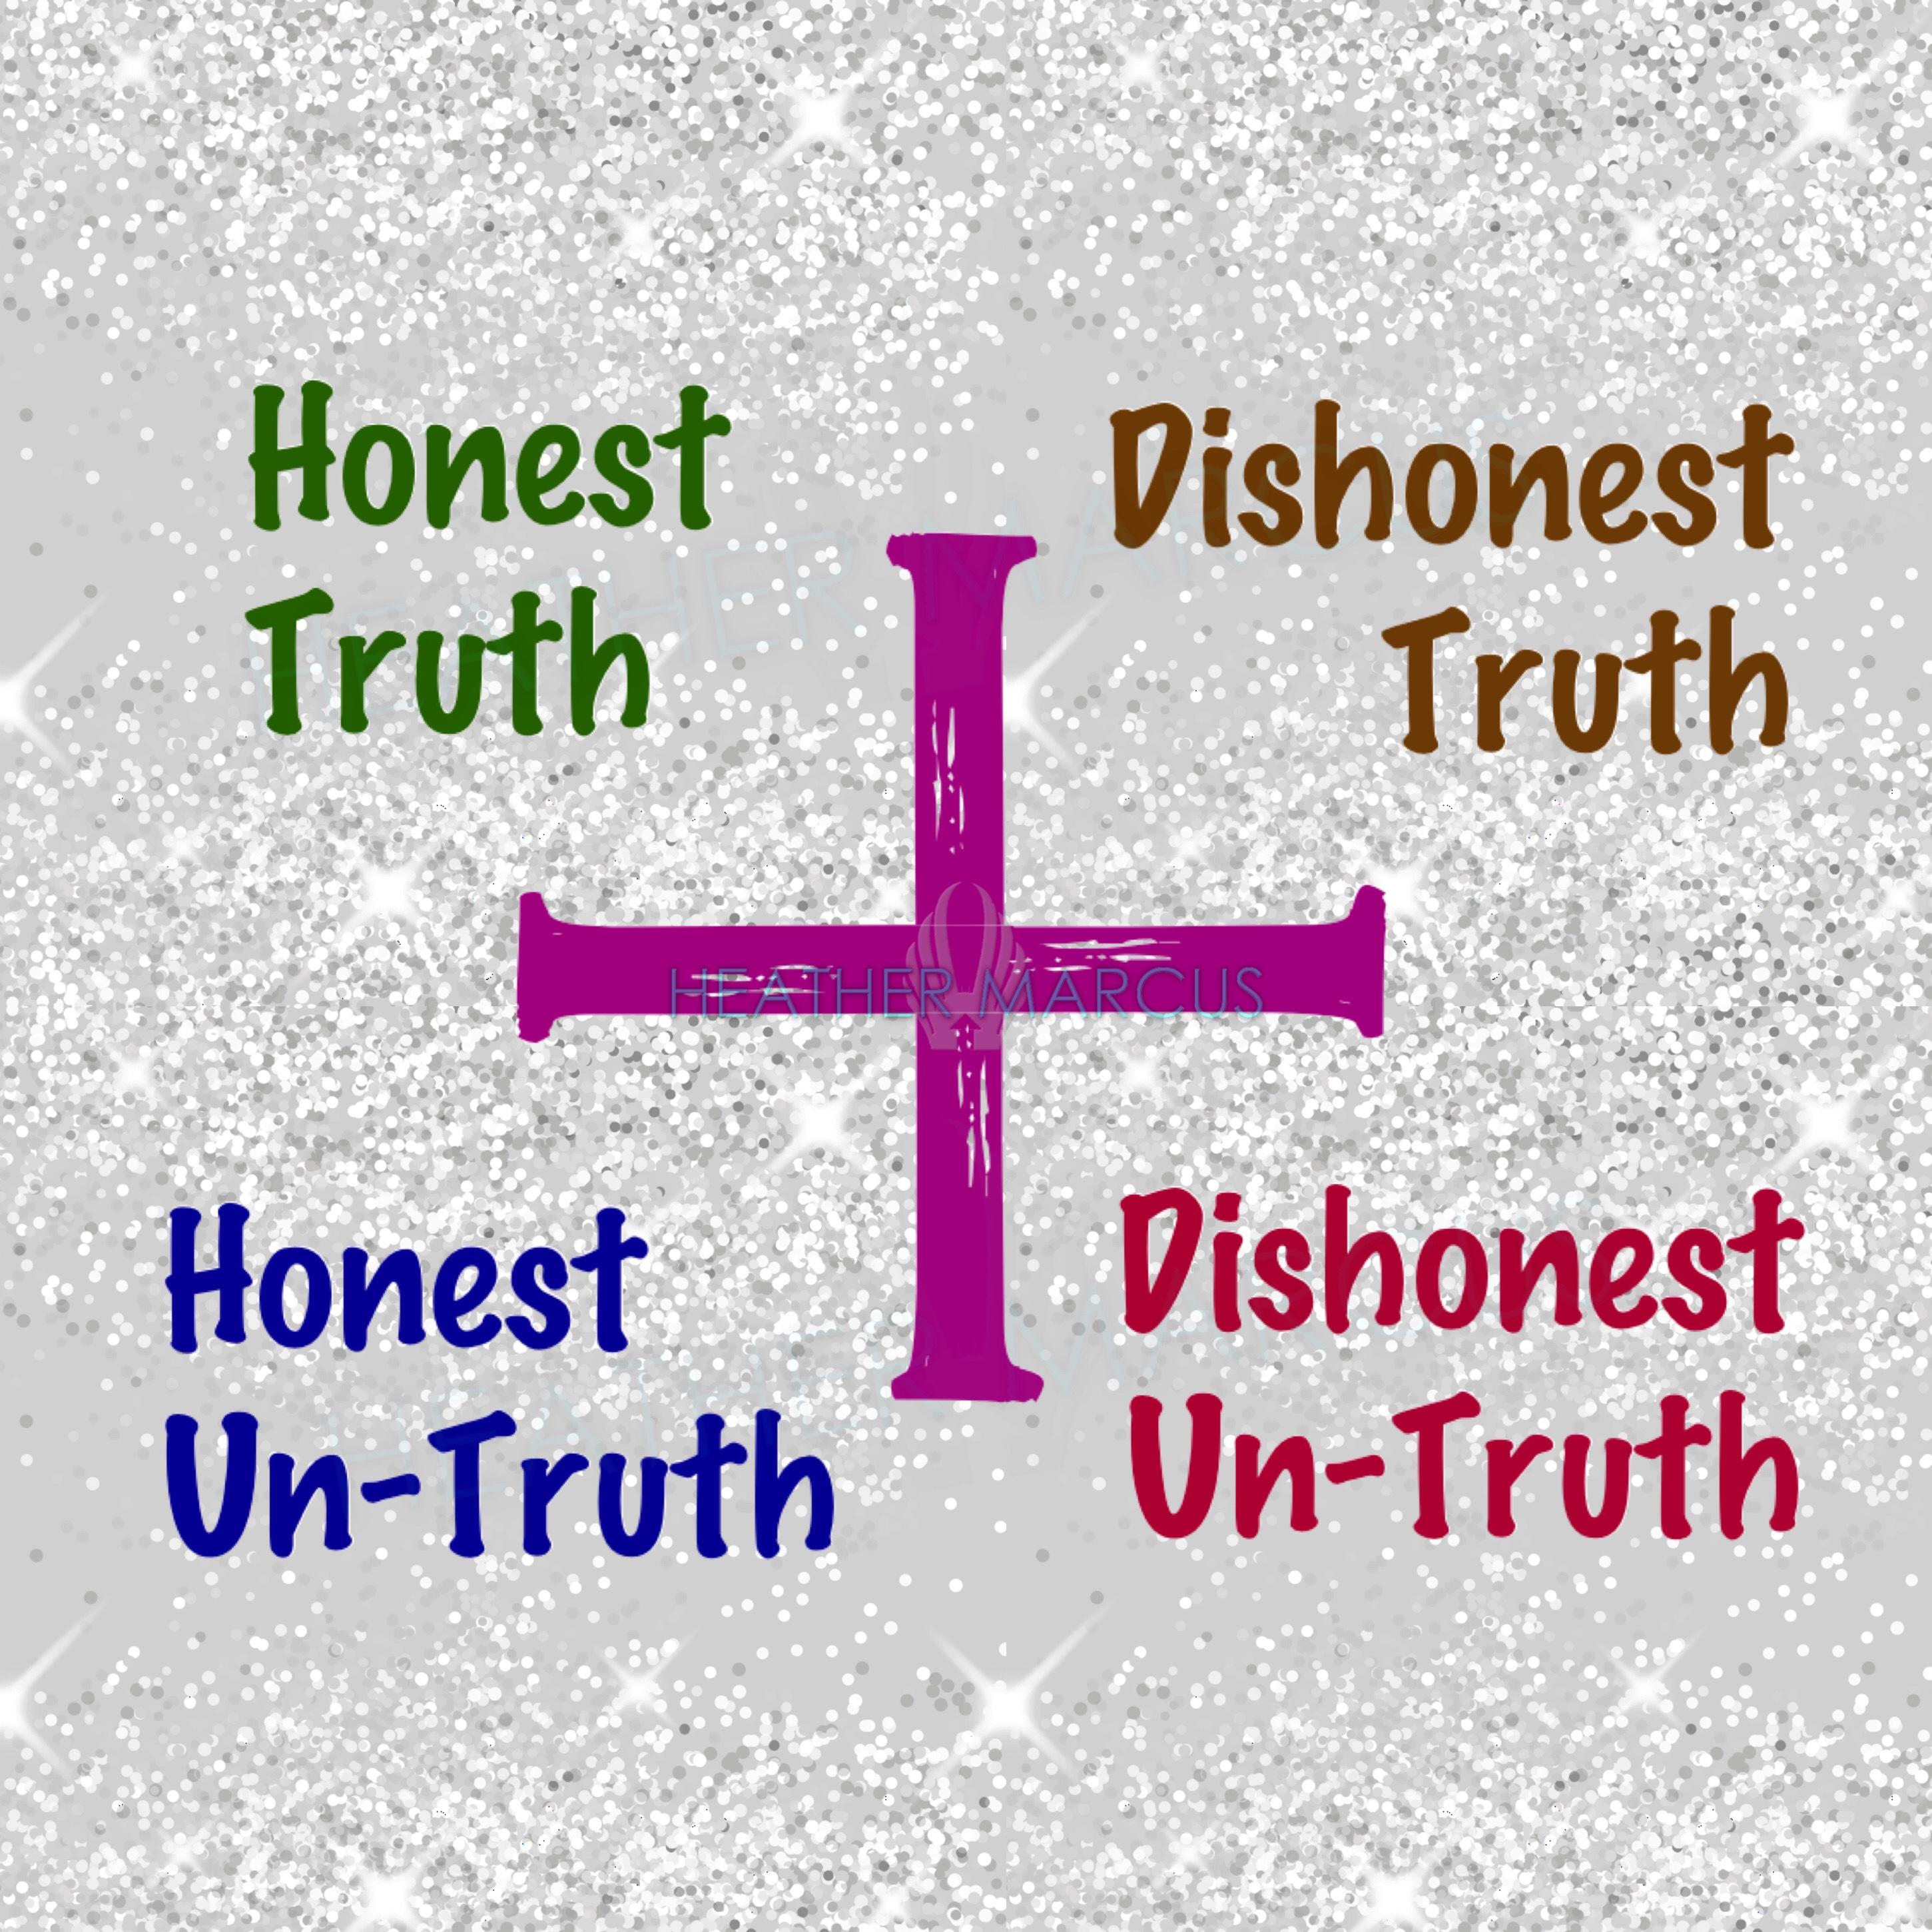 The truth honesty relationship matrix